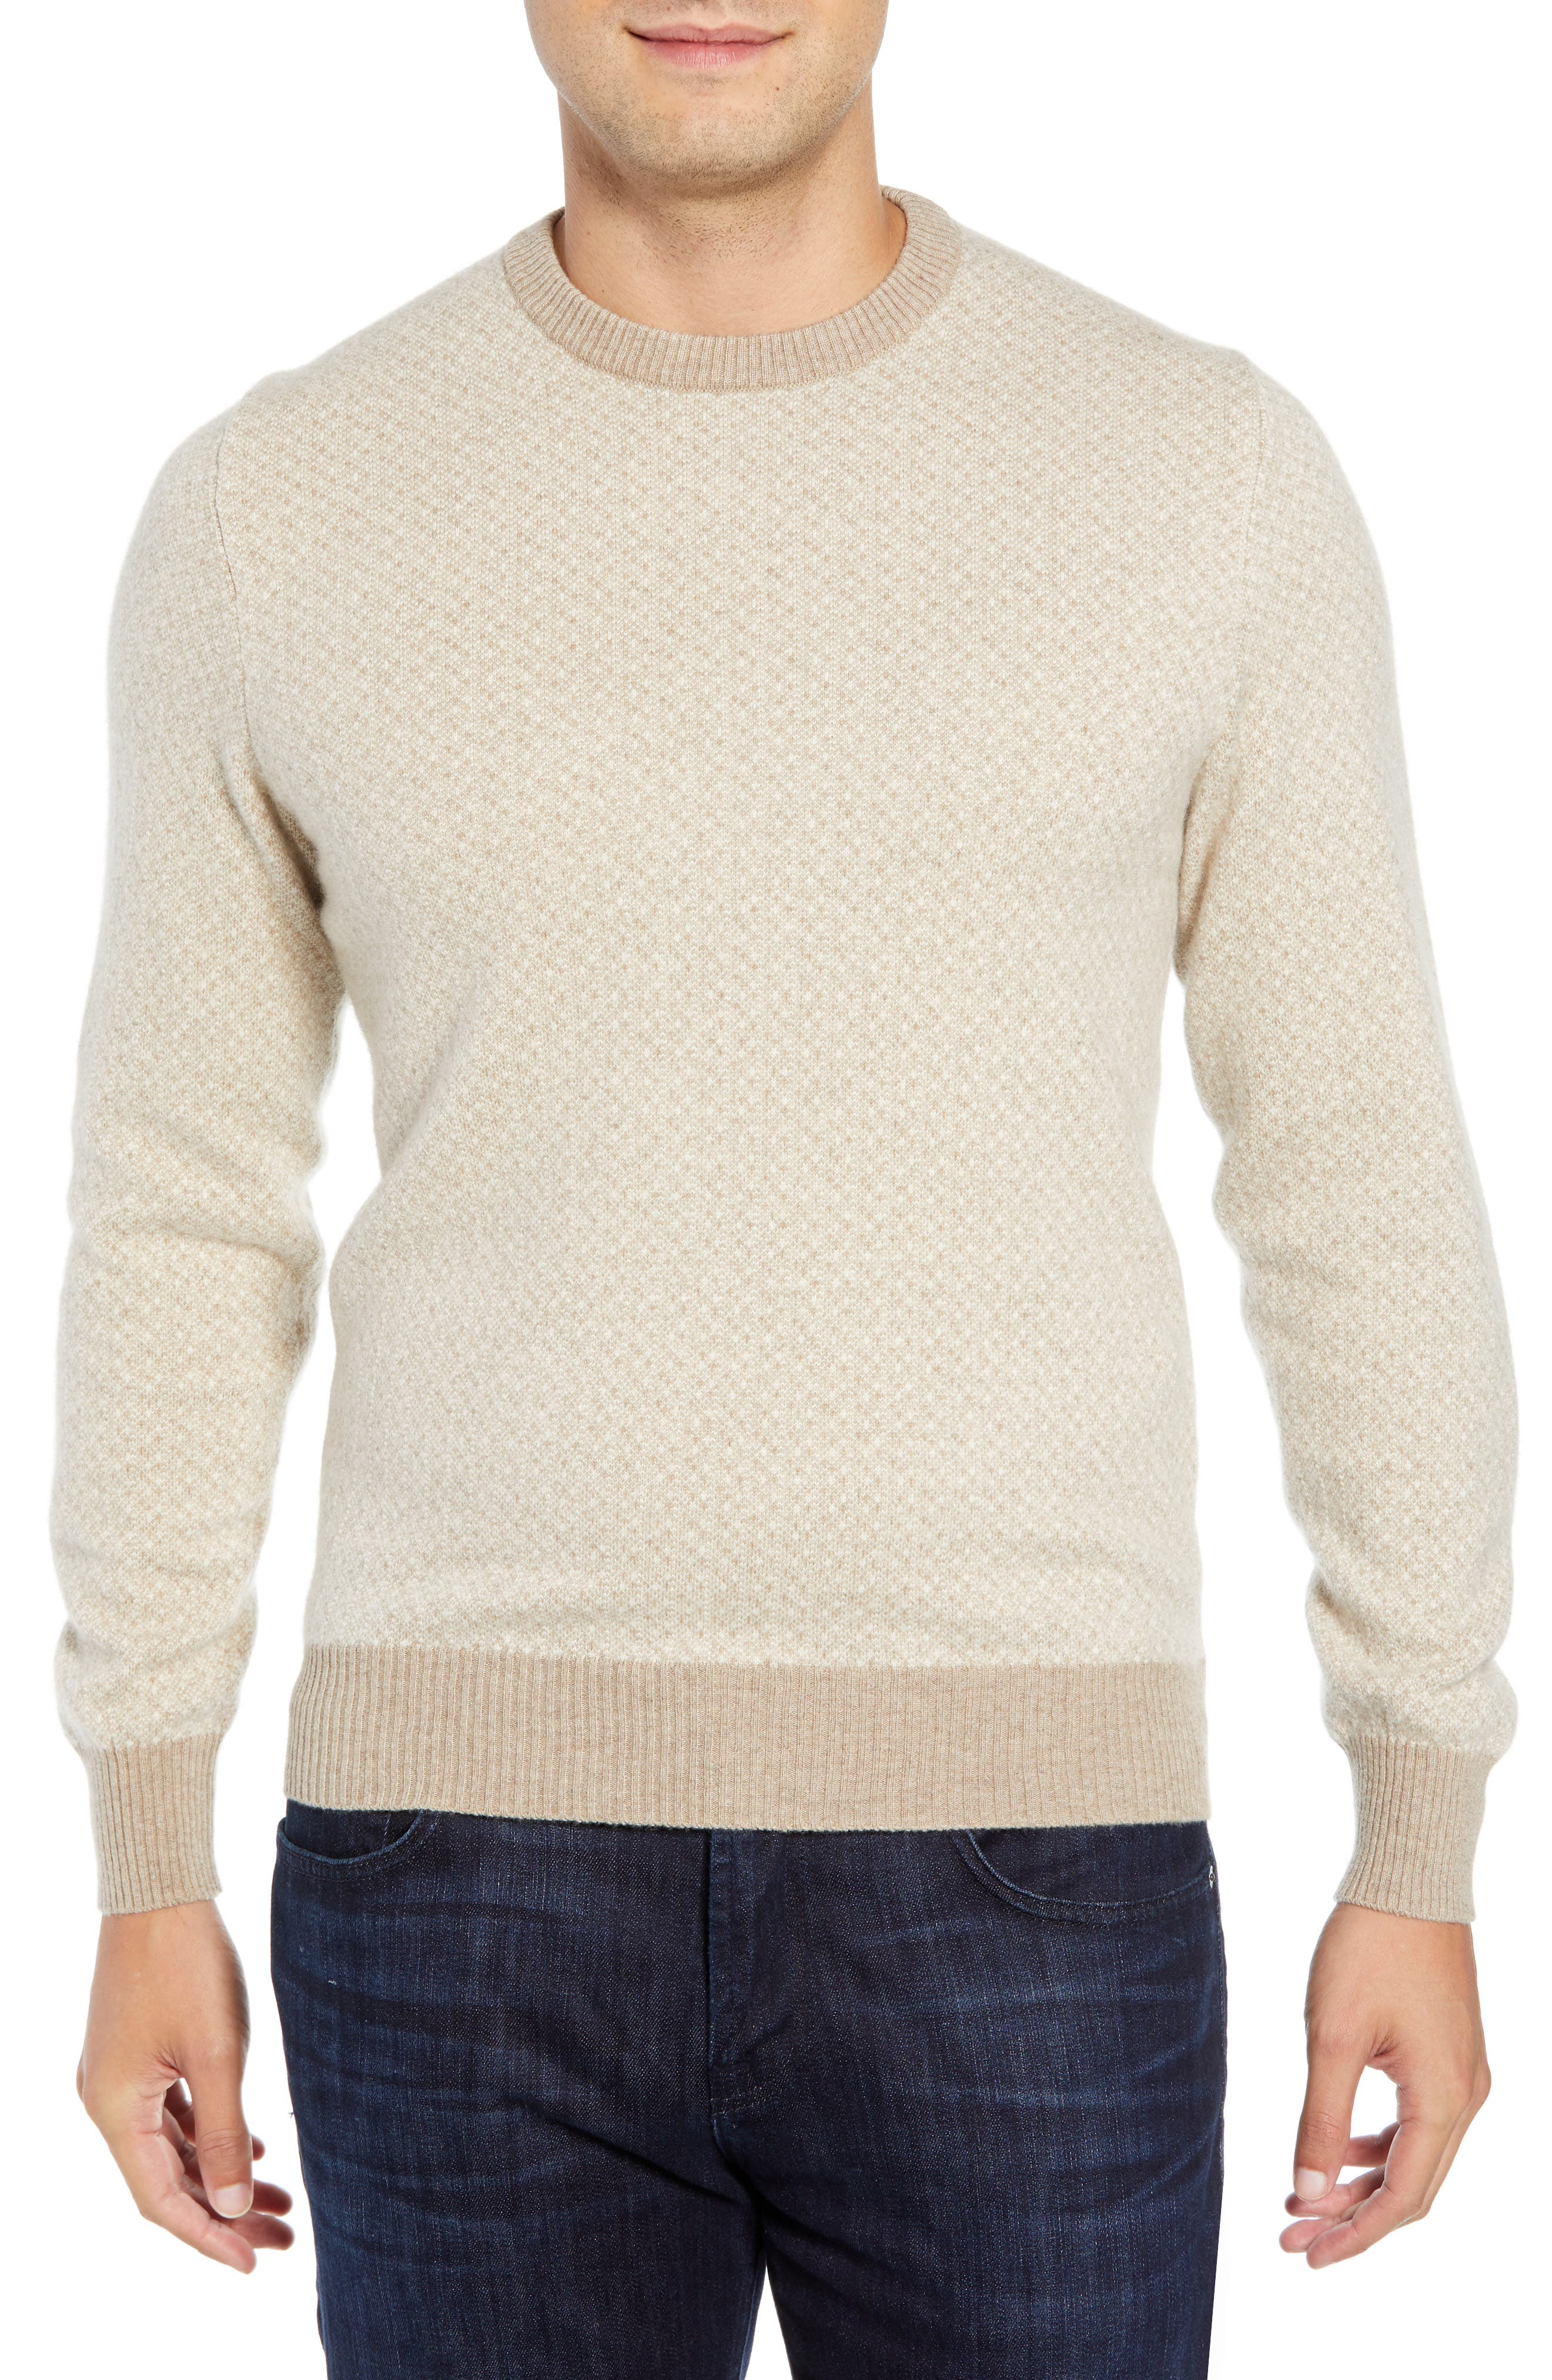 LUCIANO BARBERA Crewneck Cashmere Sweater in Beige